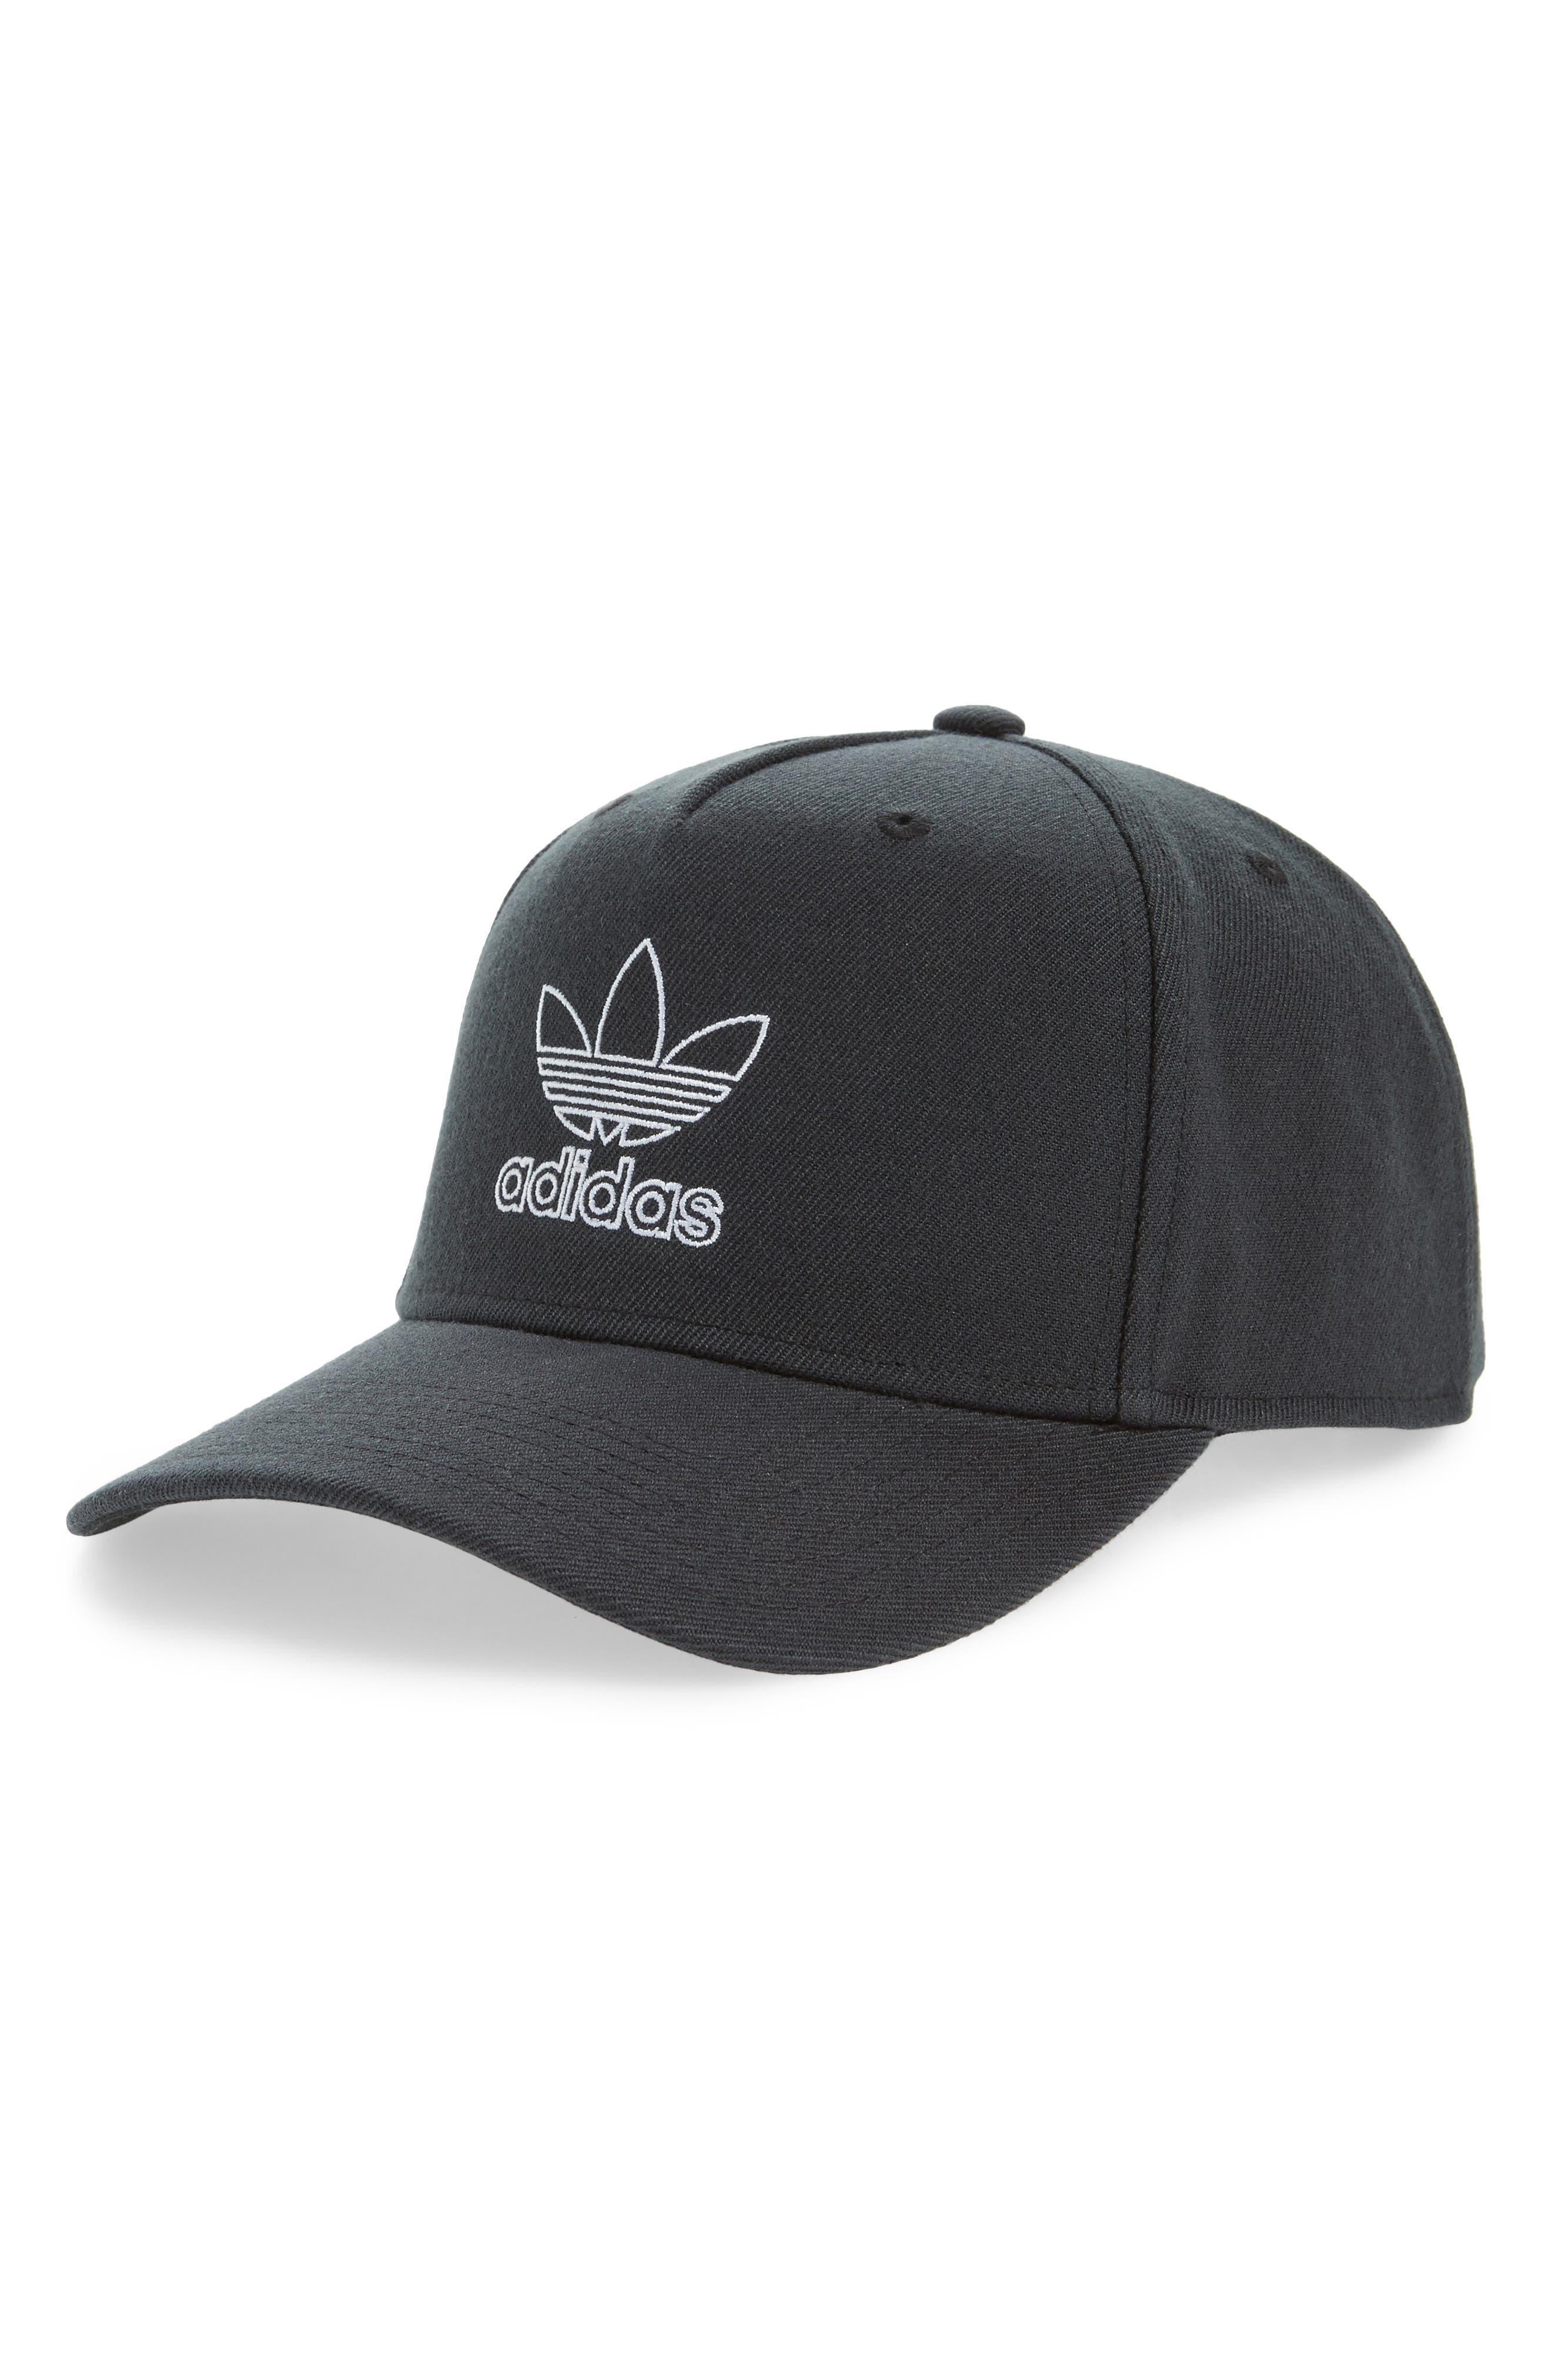 7fdd6ddd24ca8 Adidas Originals Baseball Hats for Men   Dad Hats